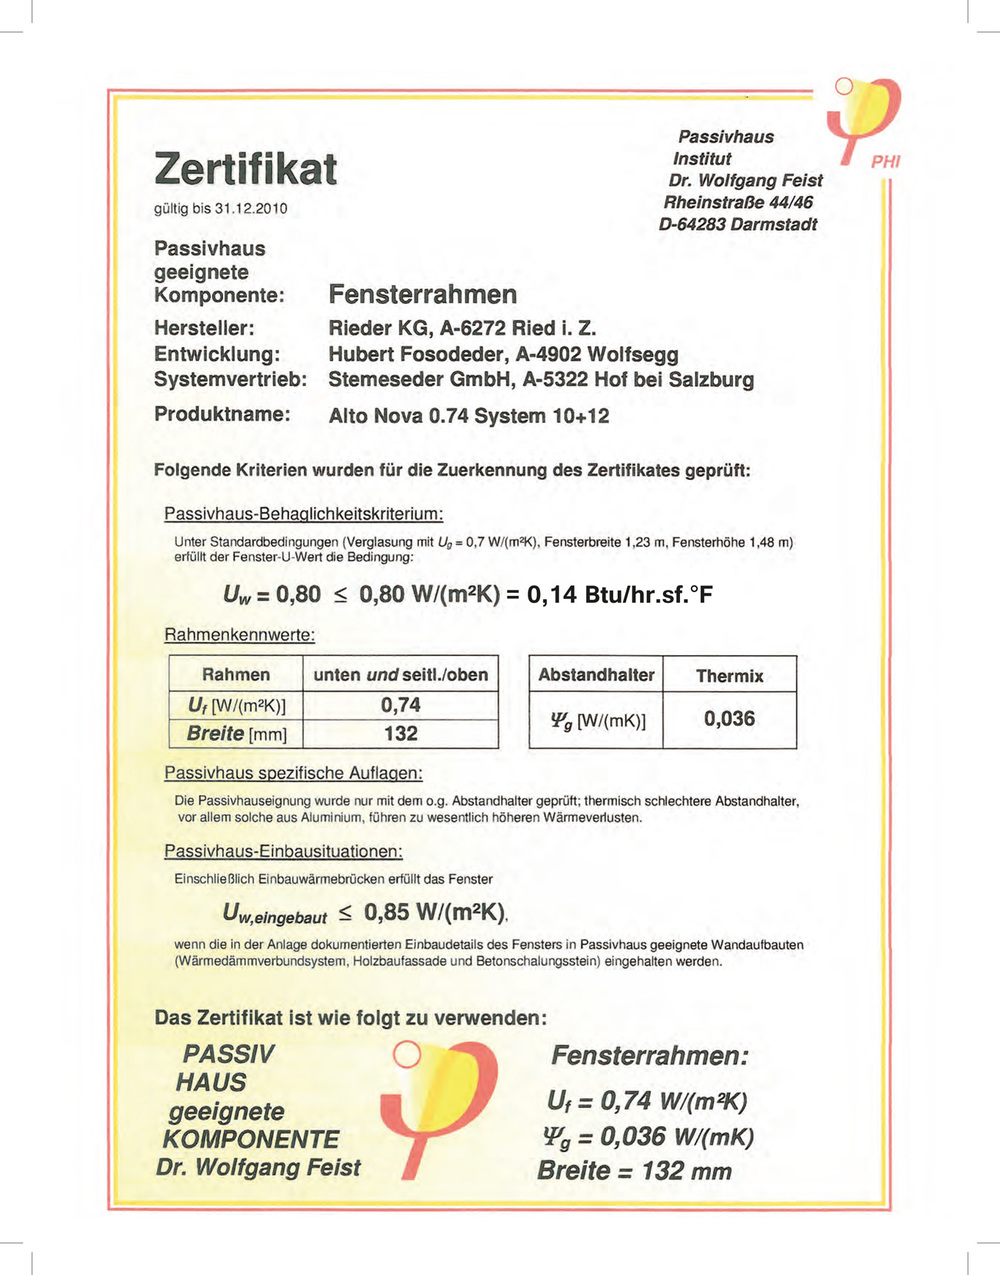 Passive house window certificate